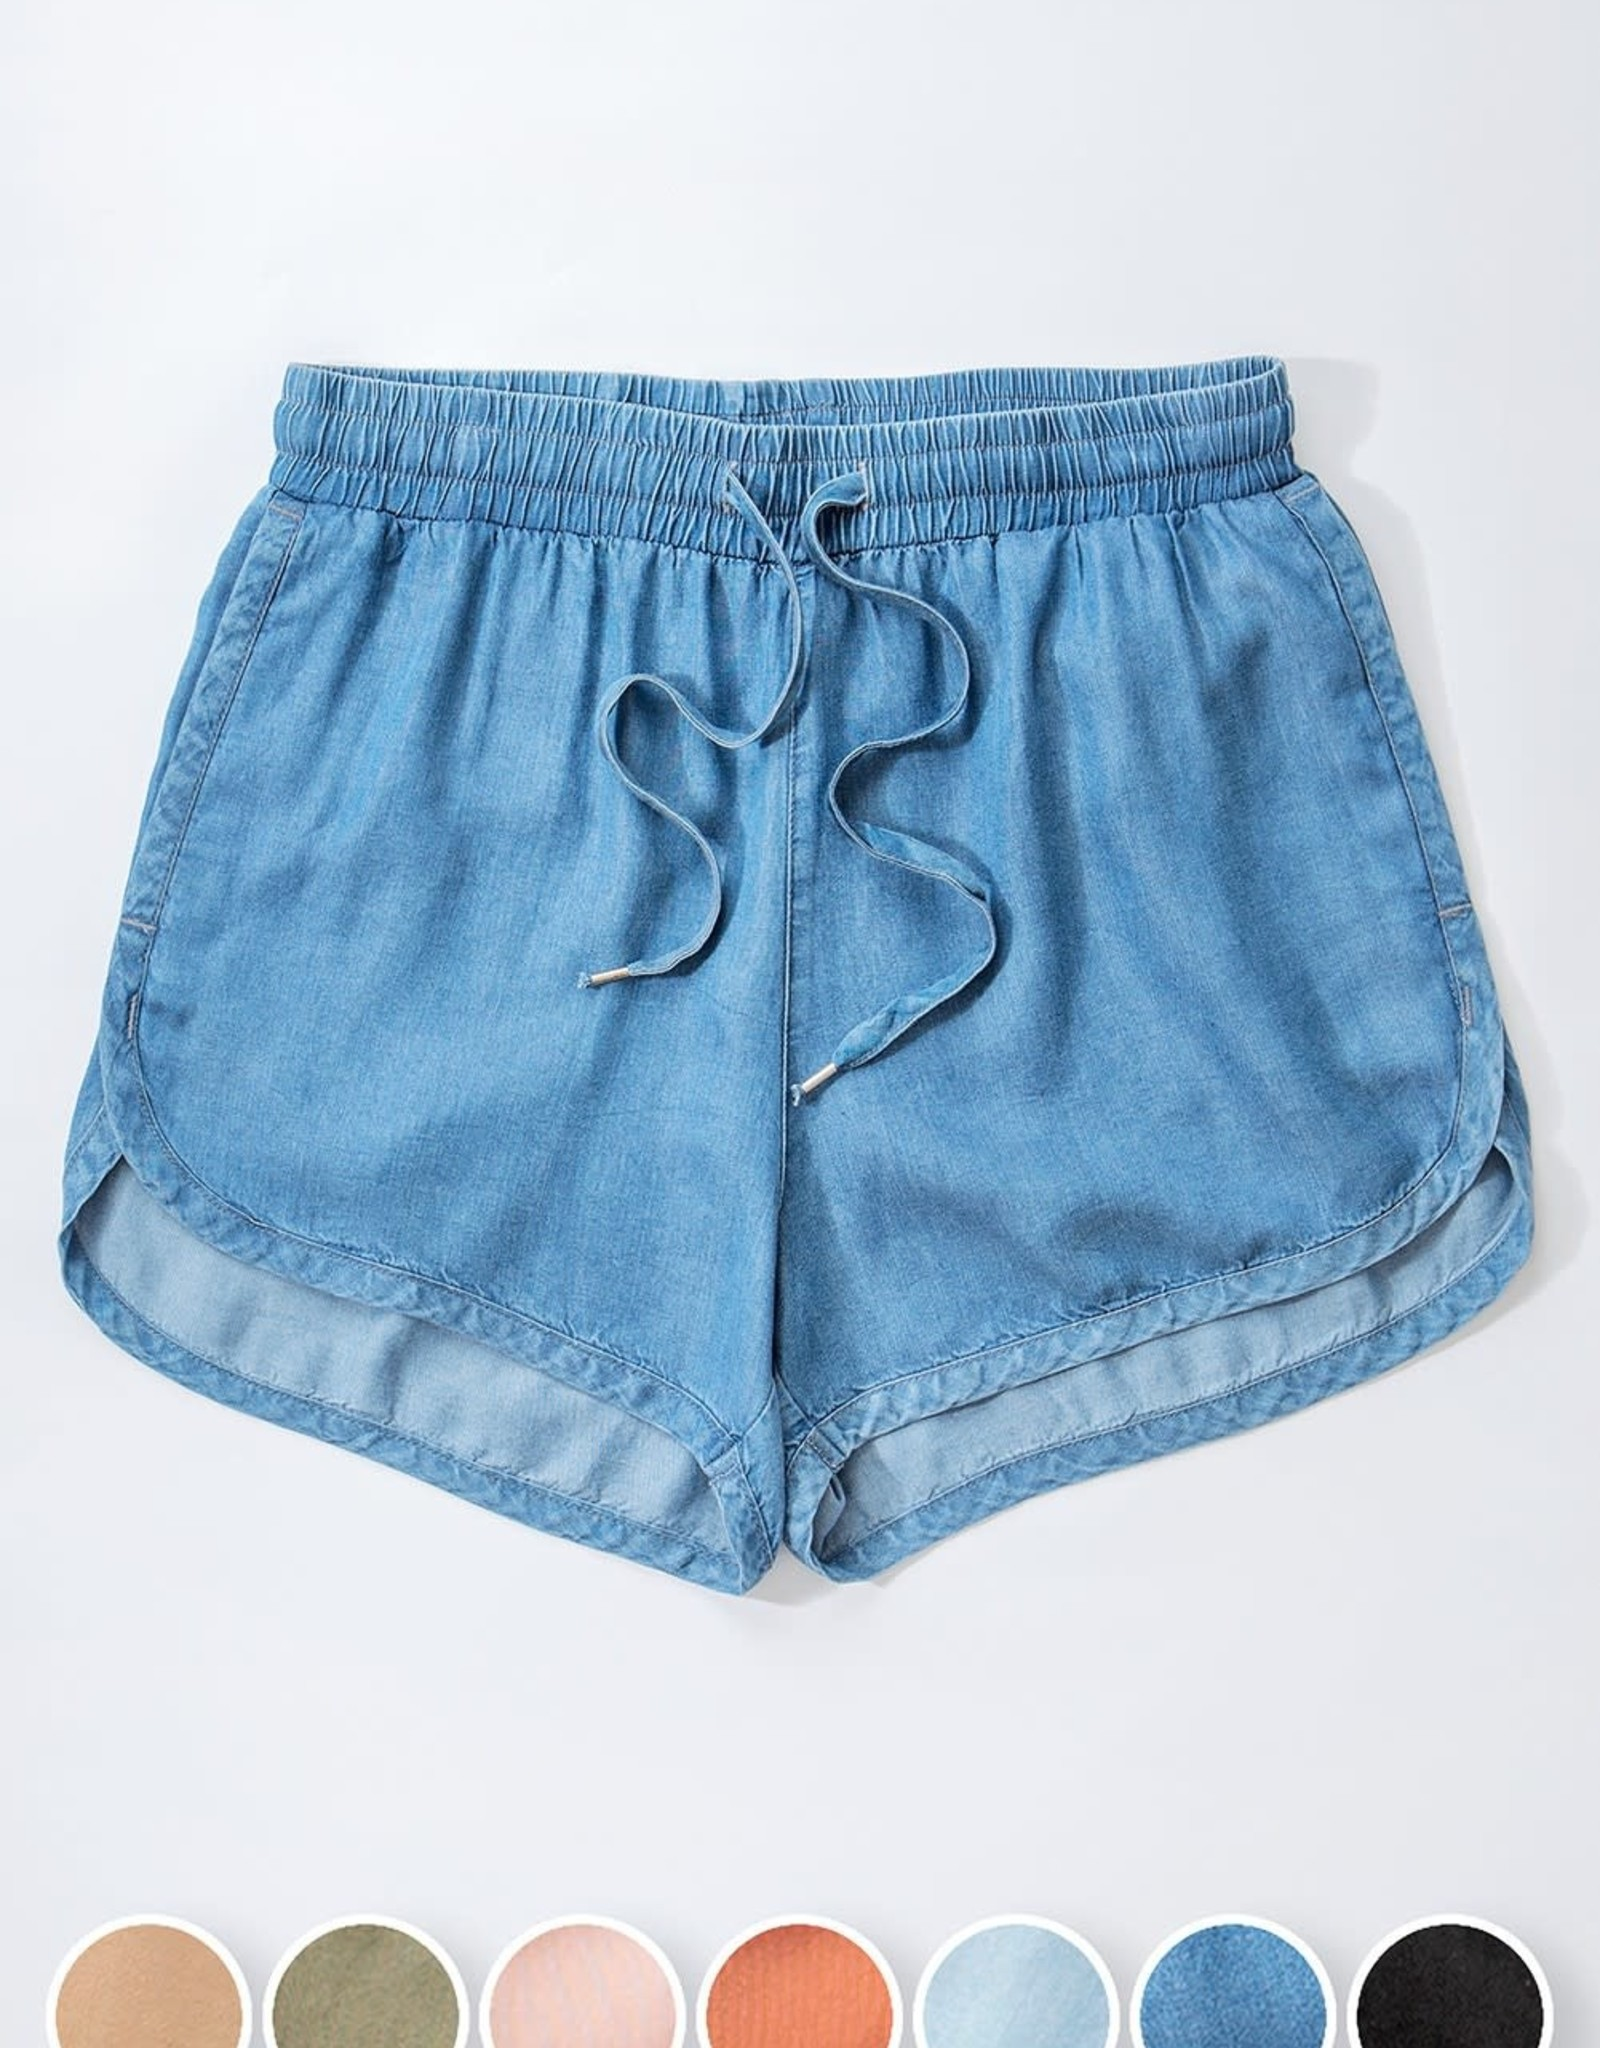 Miss Bliss Tencel Draw String Shorts- Blue